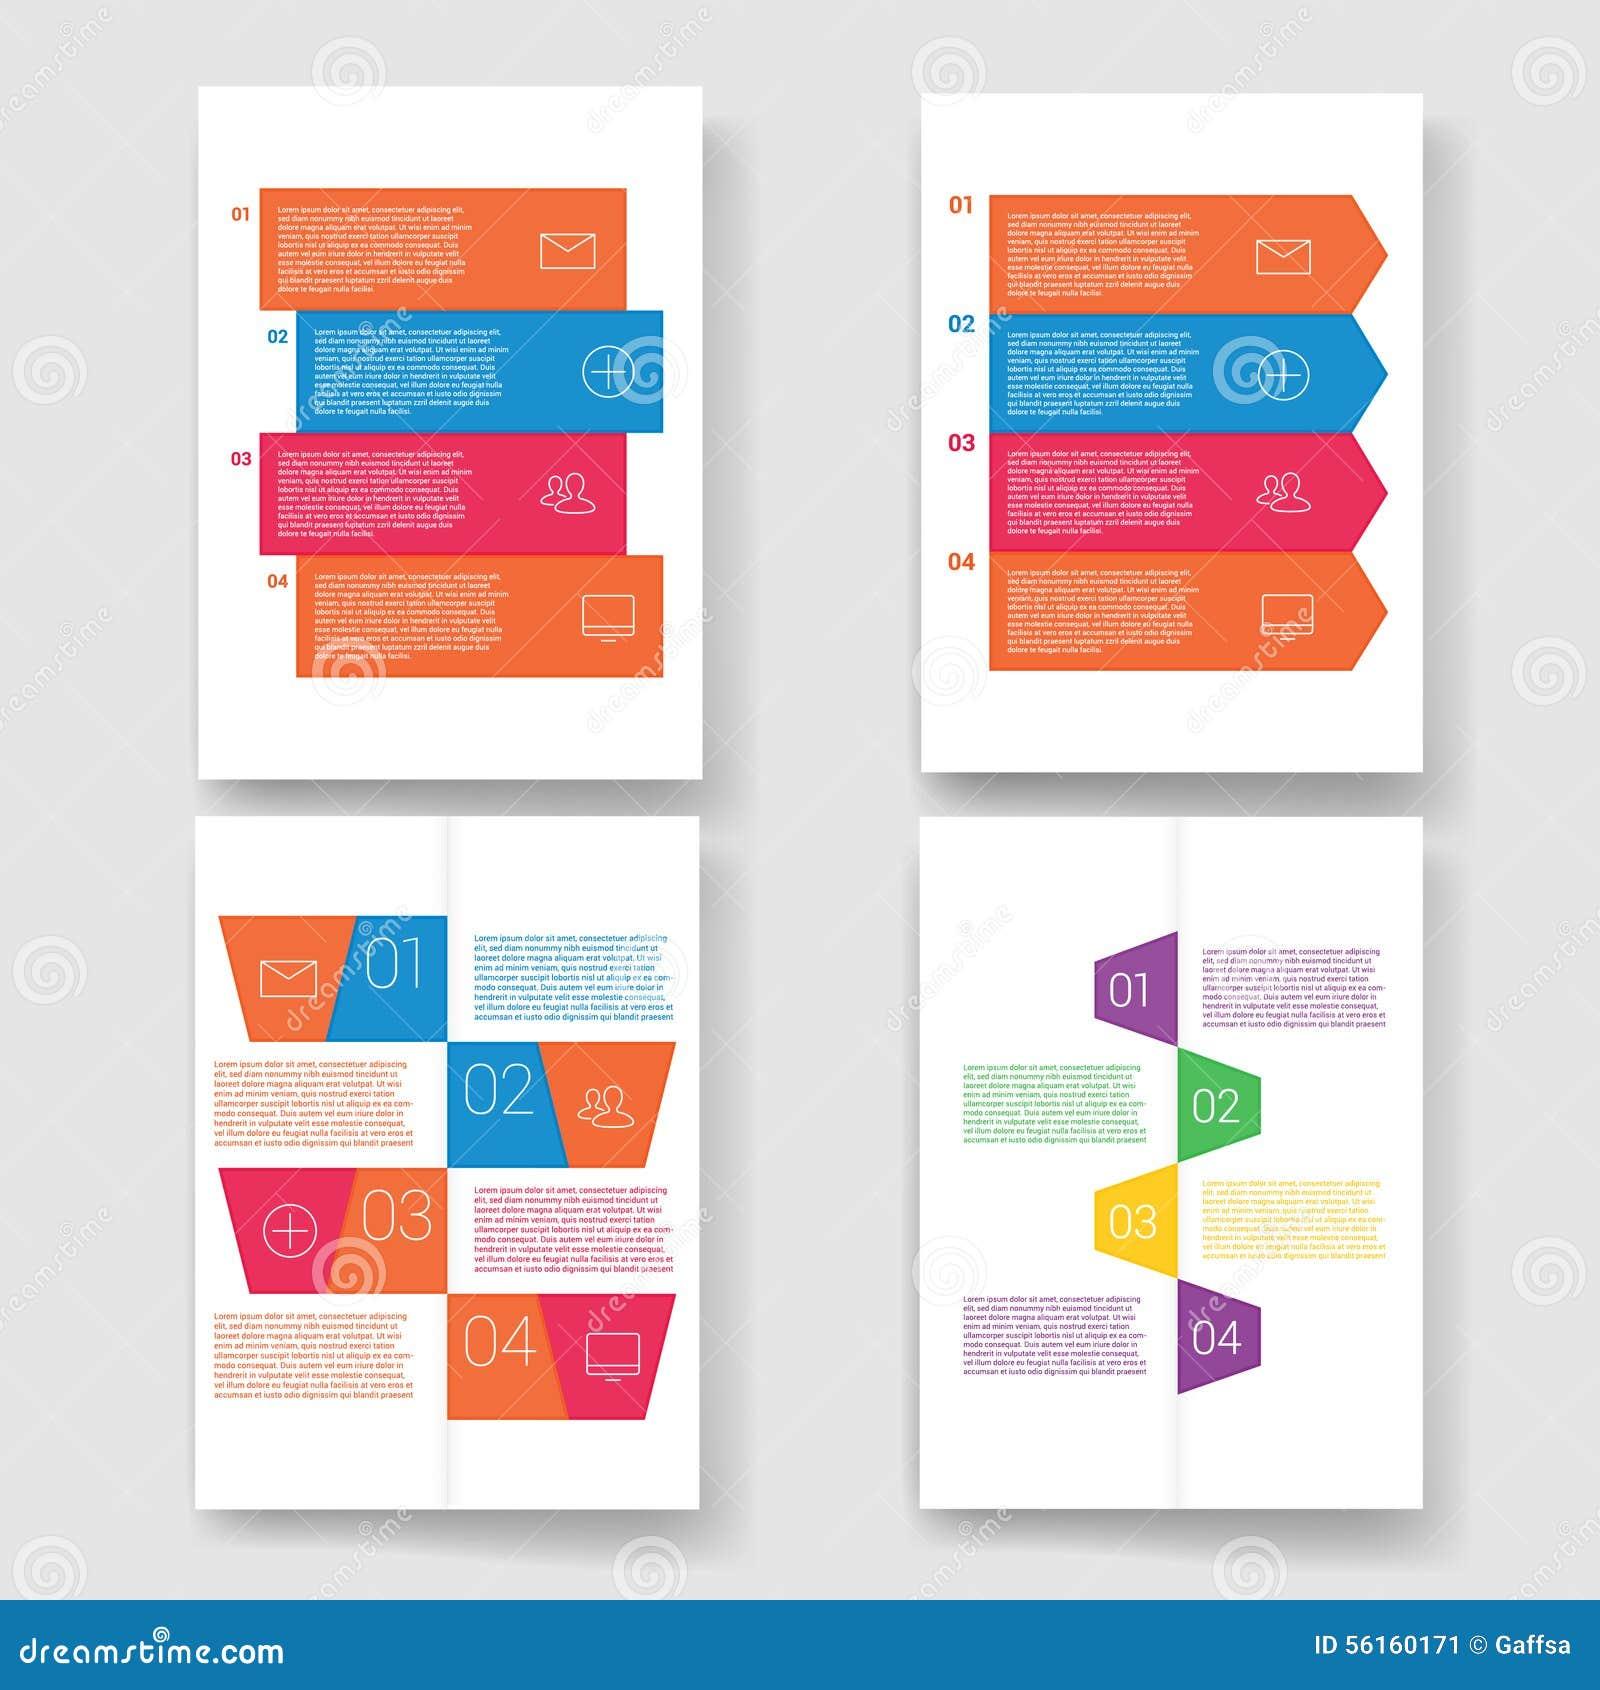 mail designer pro templates - templates design set of web mail brochures stock vector